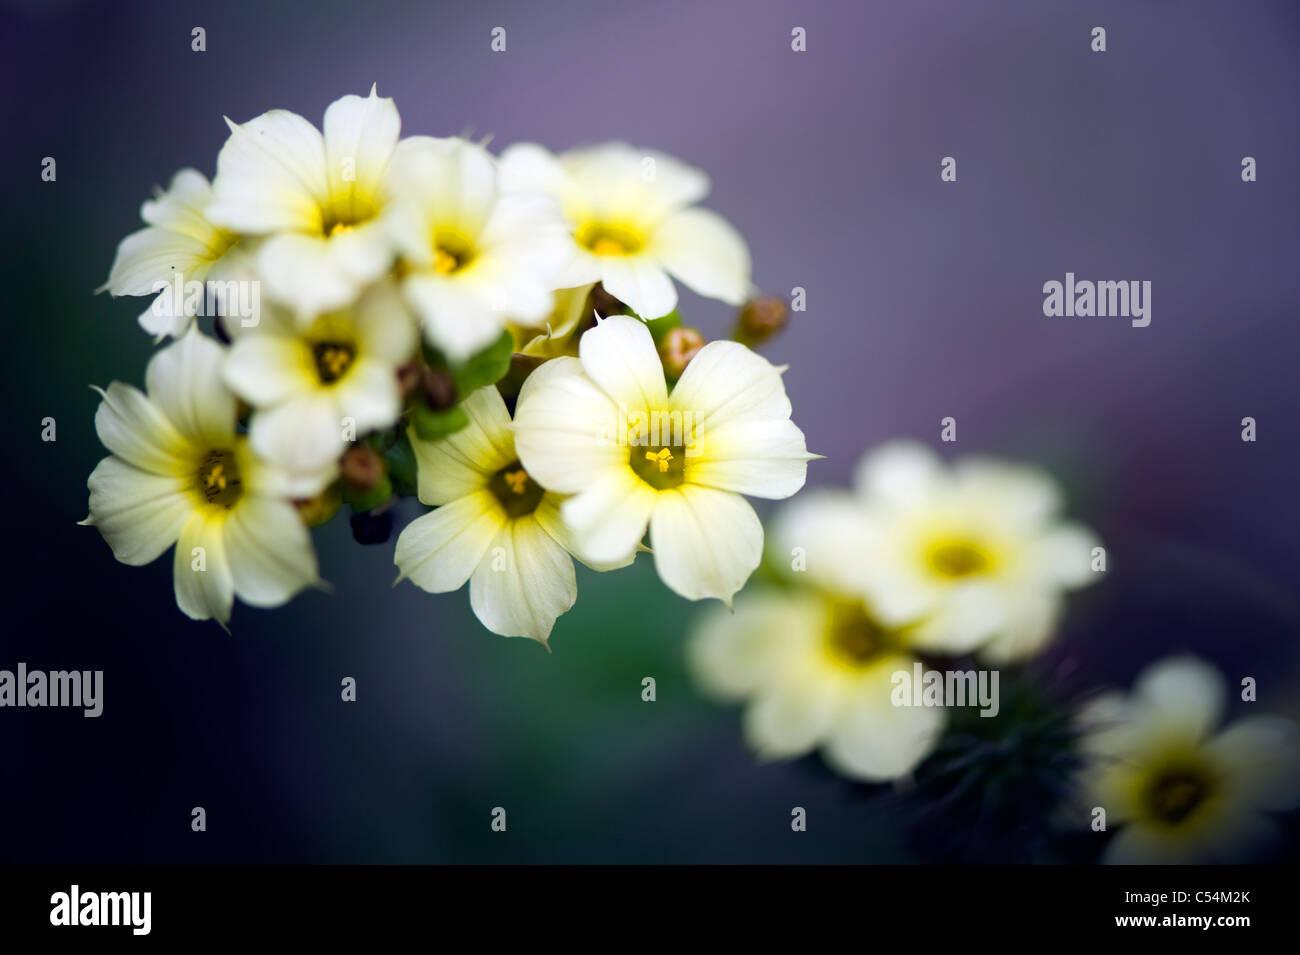 Sisyrinchium striatum 'Aunt May' - Pale yellow-eyed grass 'Aunt May' - Stock Image